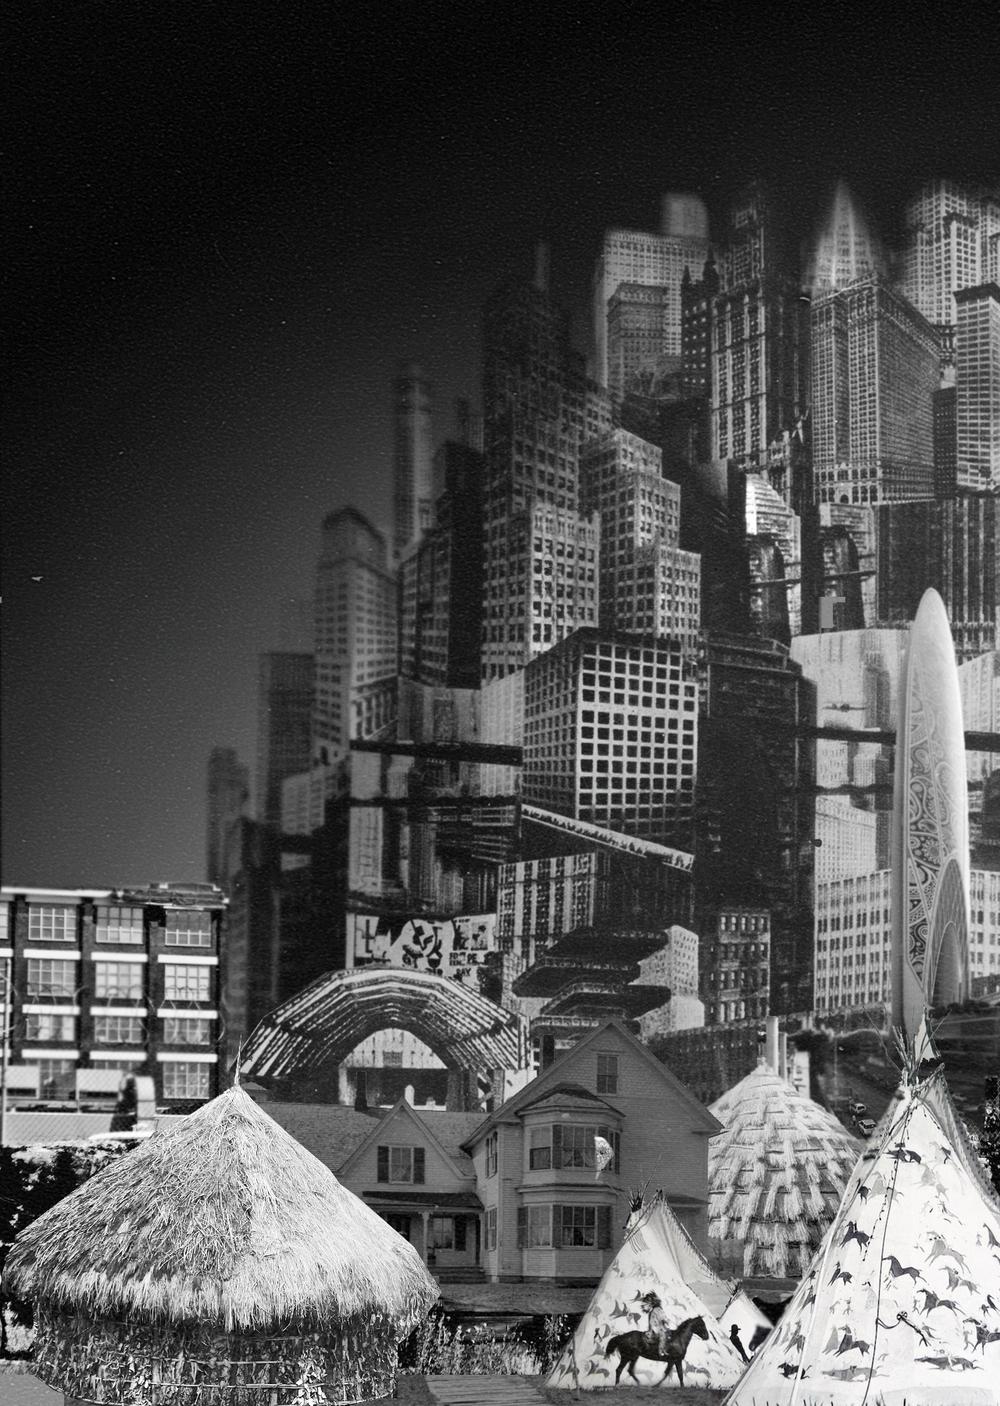 Metropolis: The Global Village